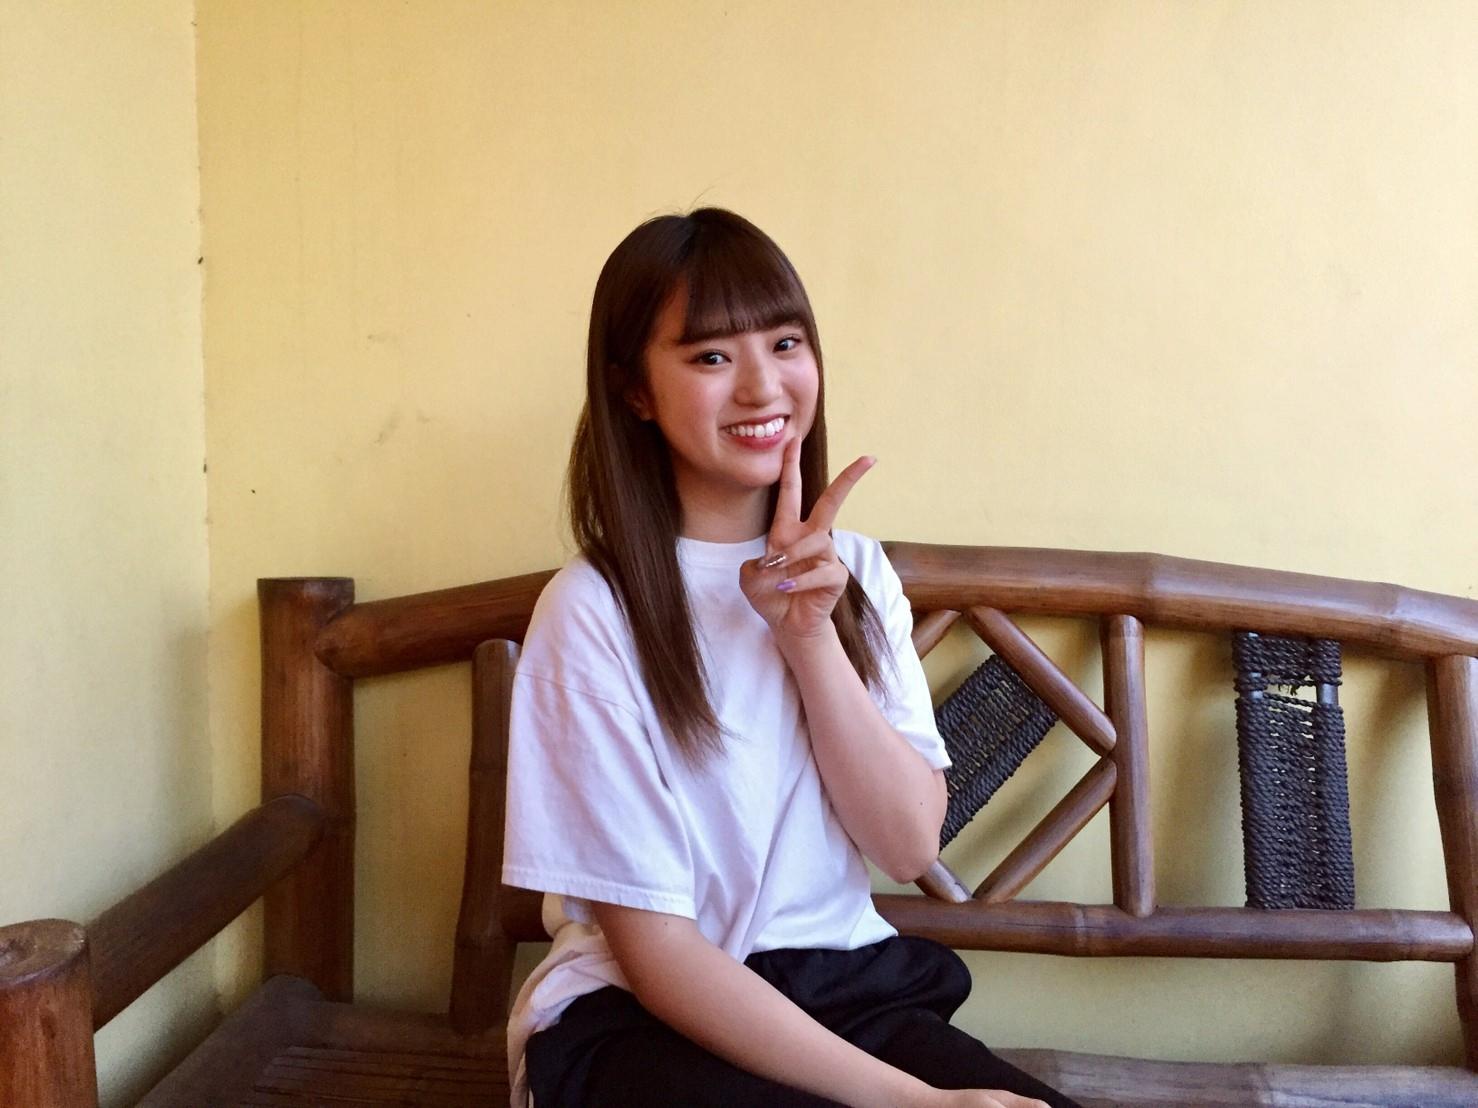 BeautyPlus_20190806174120640_save